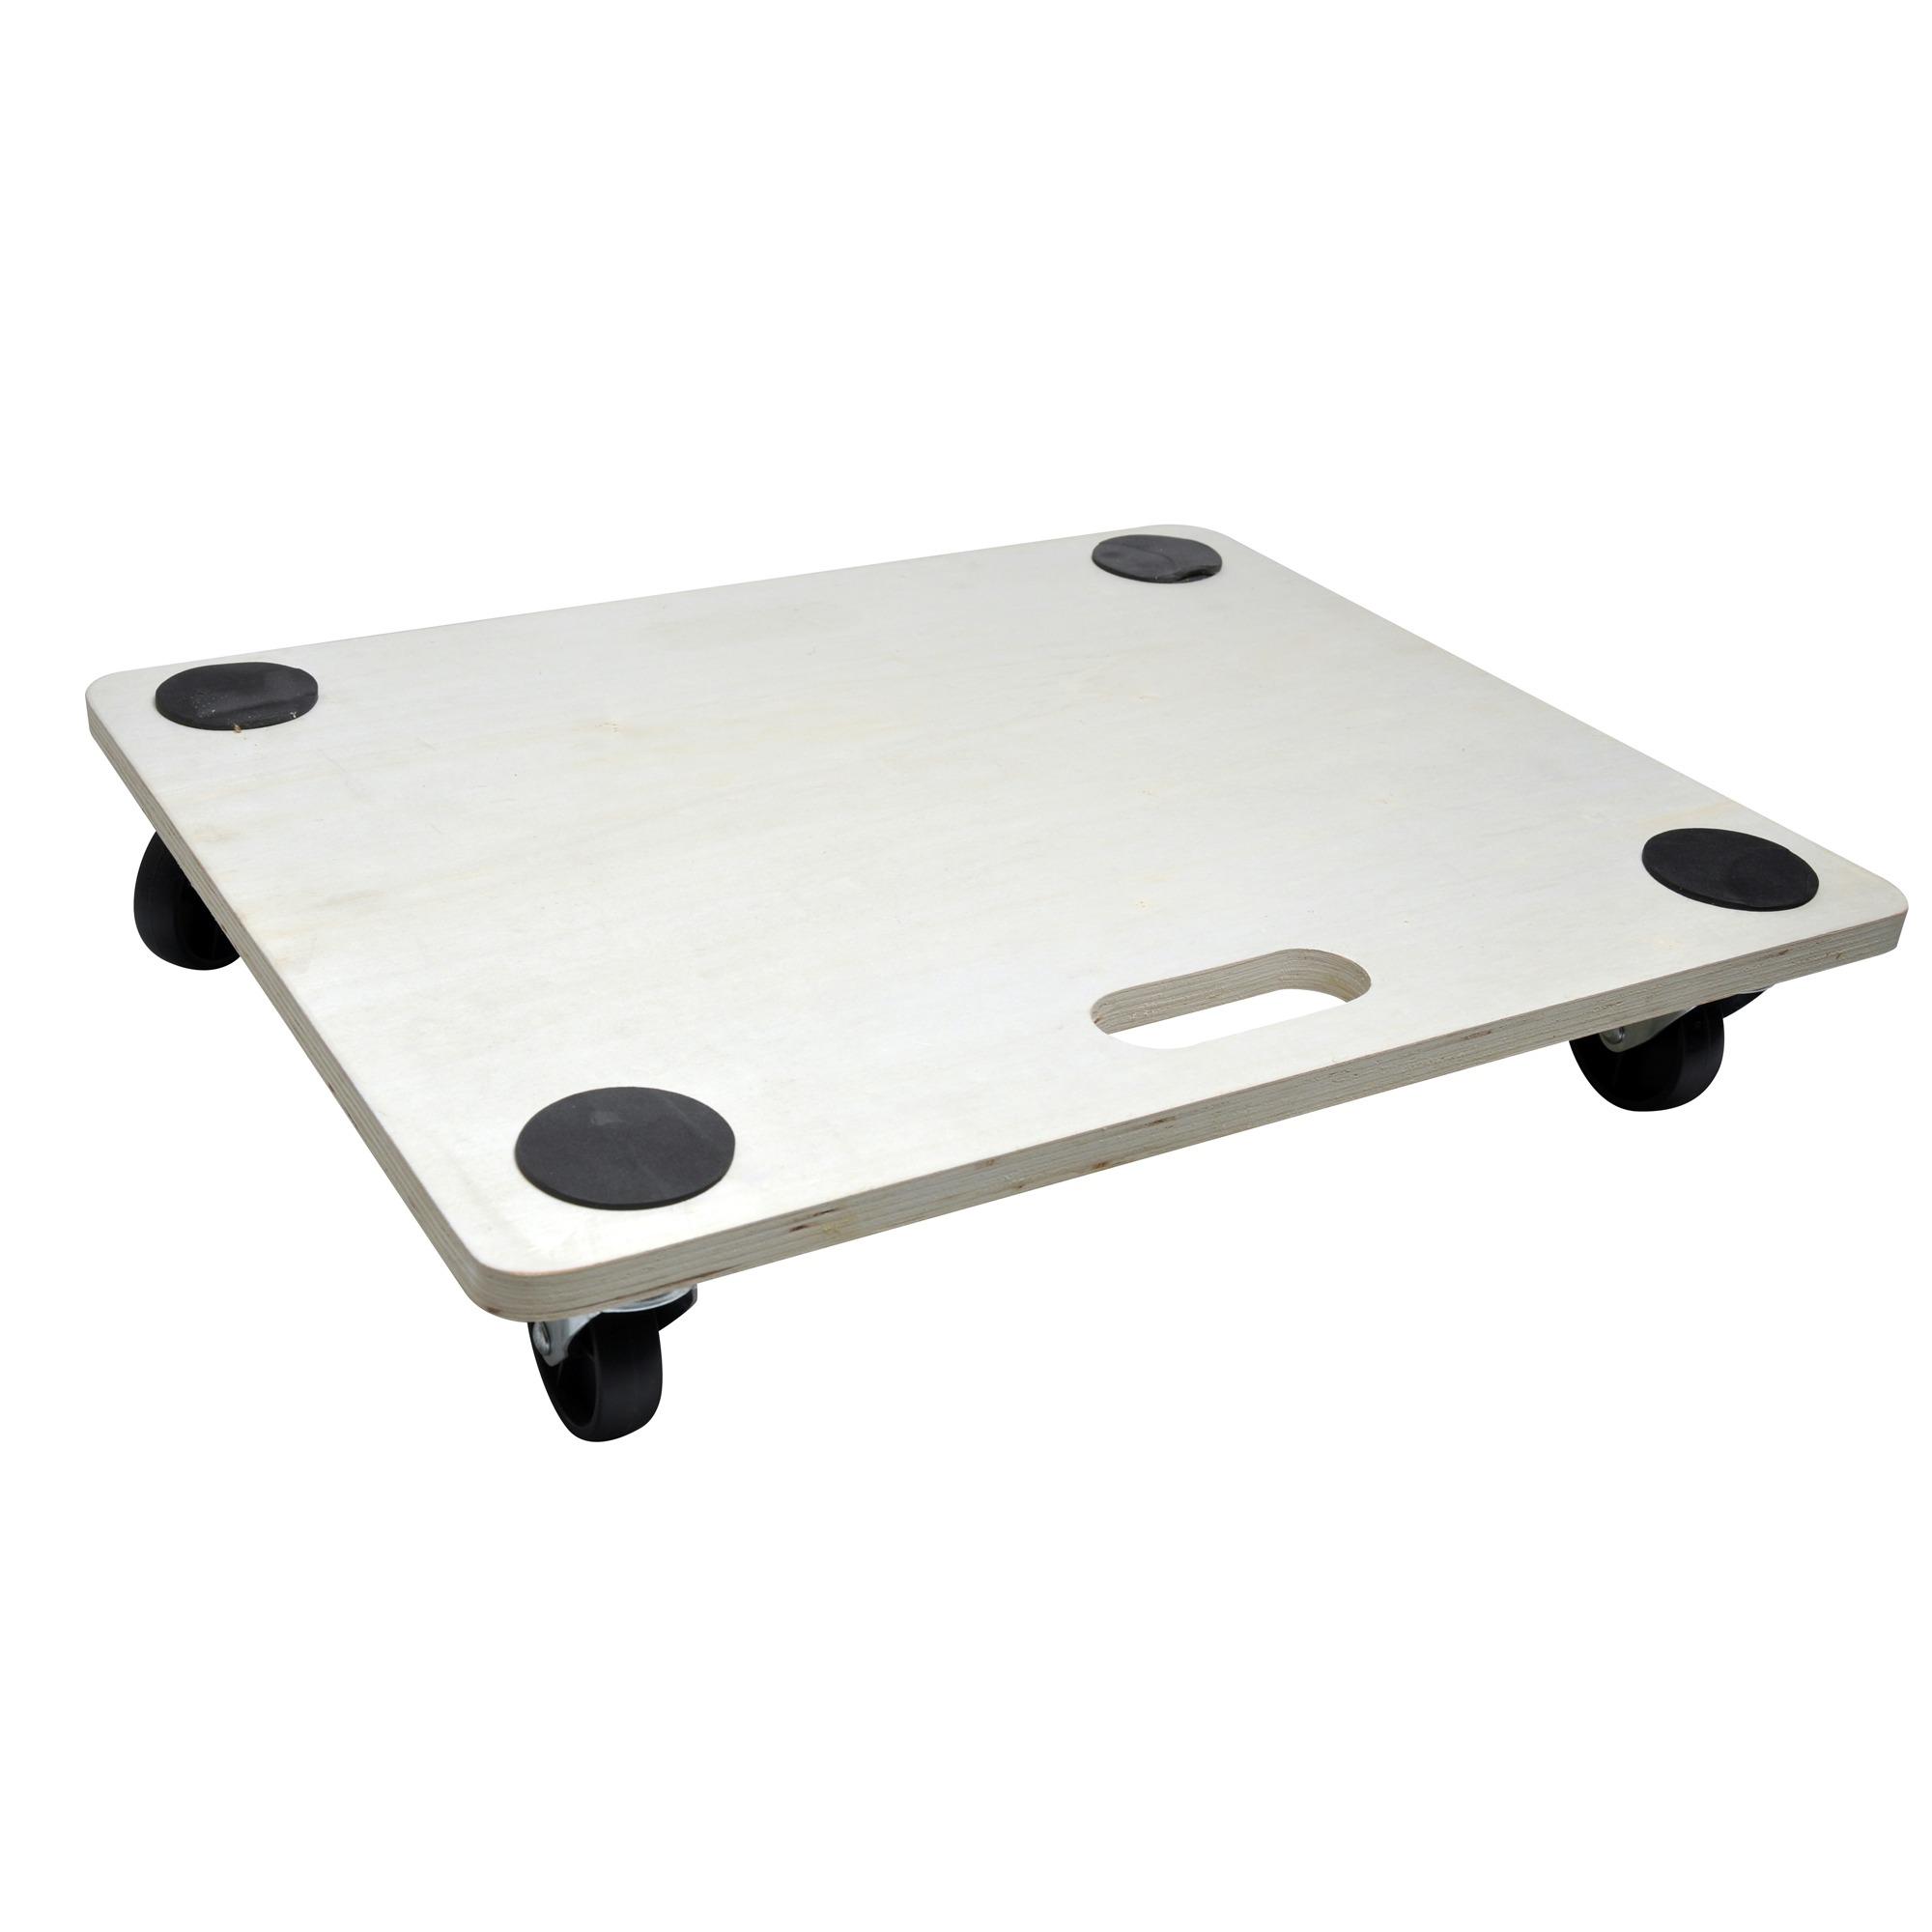 Handson meubeltransporter multiplex 59×49 cm met harde wielen en anti-slip (max. 200 kg)